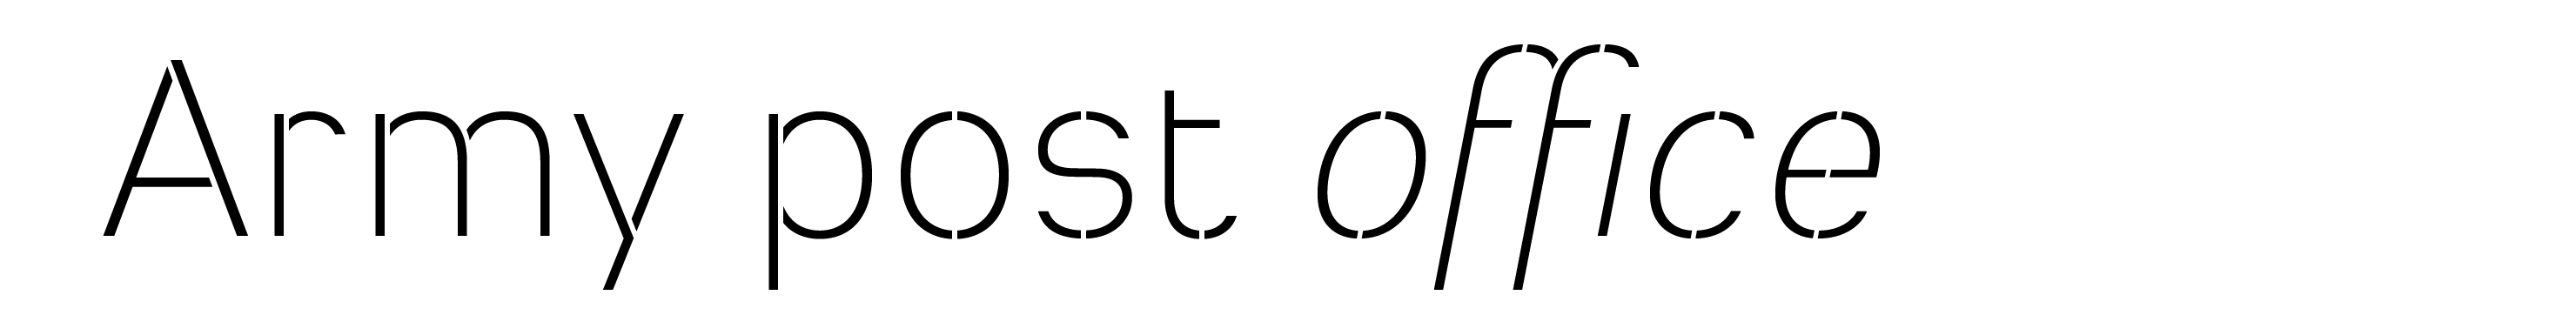 Typeface Heimat Stencil D07 Atlas Font Foundry